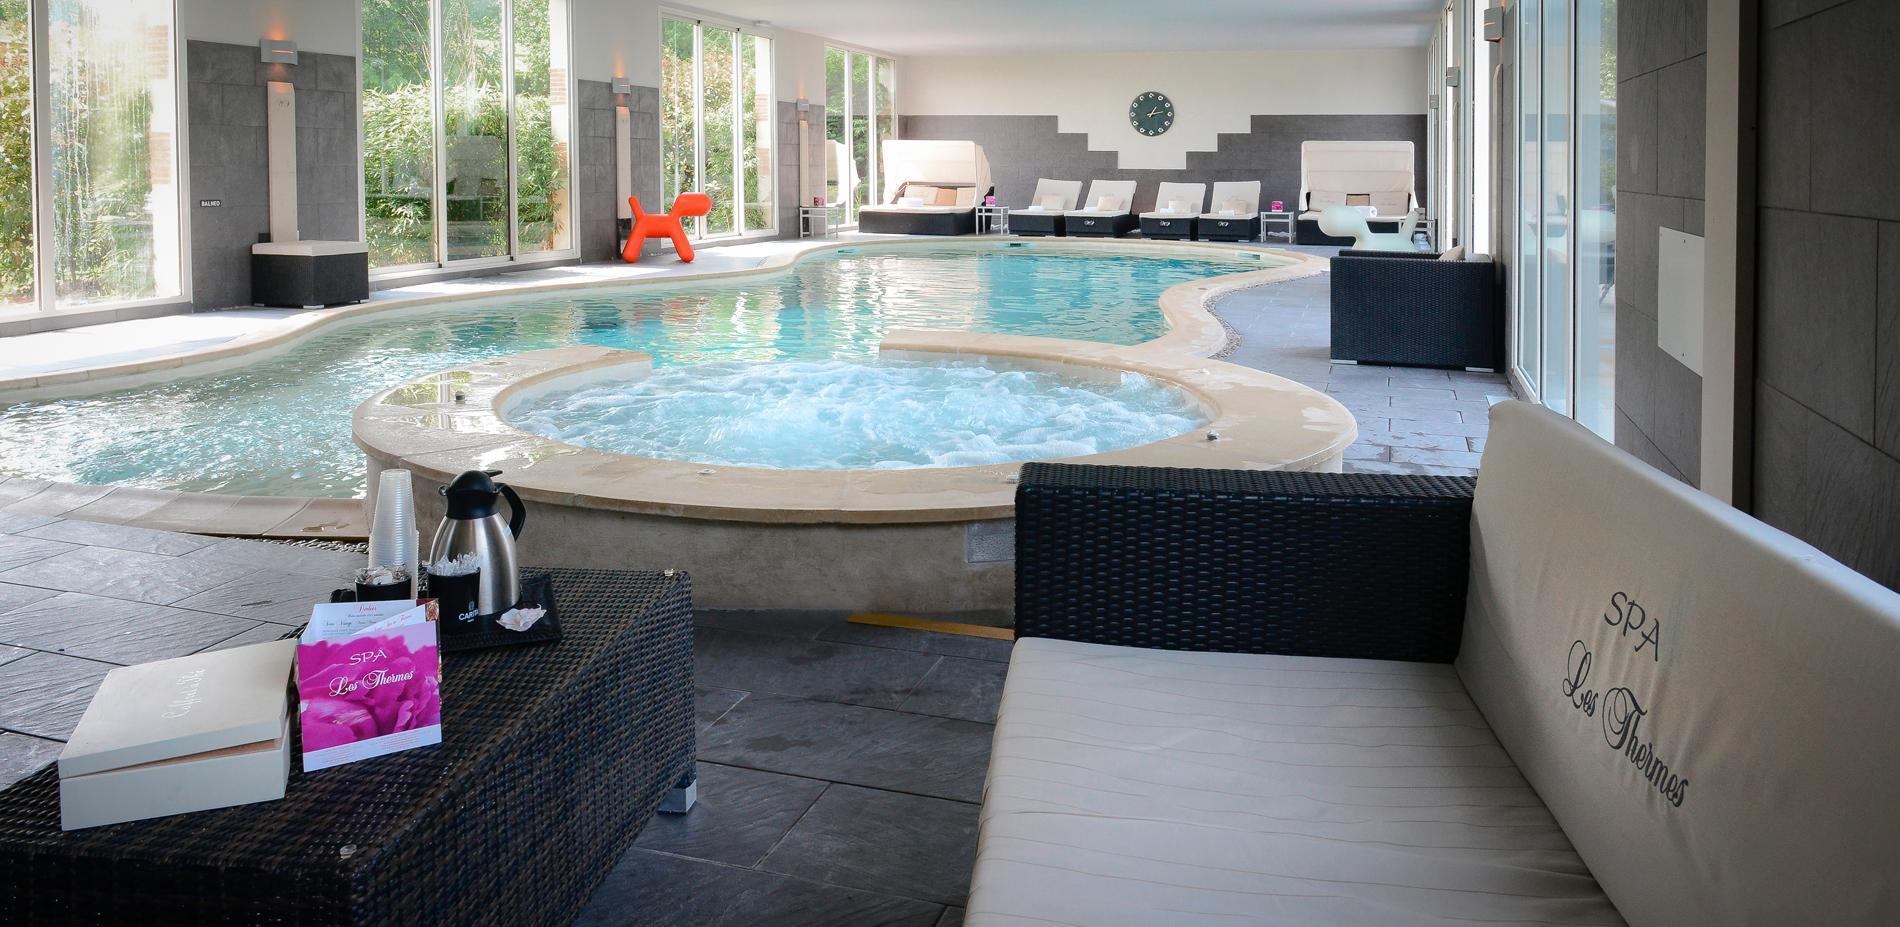 Hotel Luxe Honfleur Avec Piscine